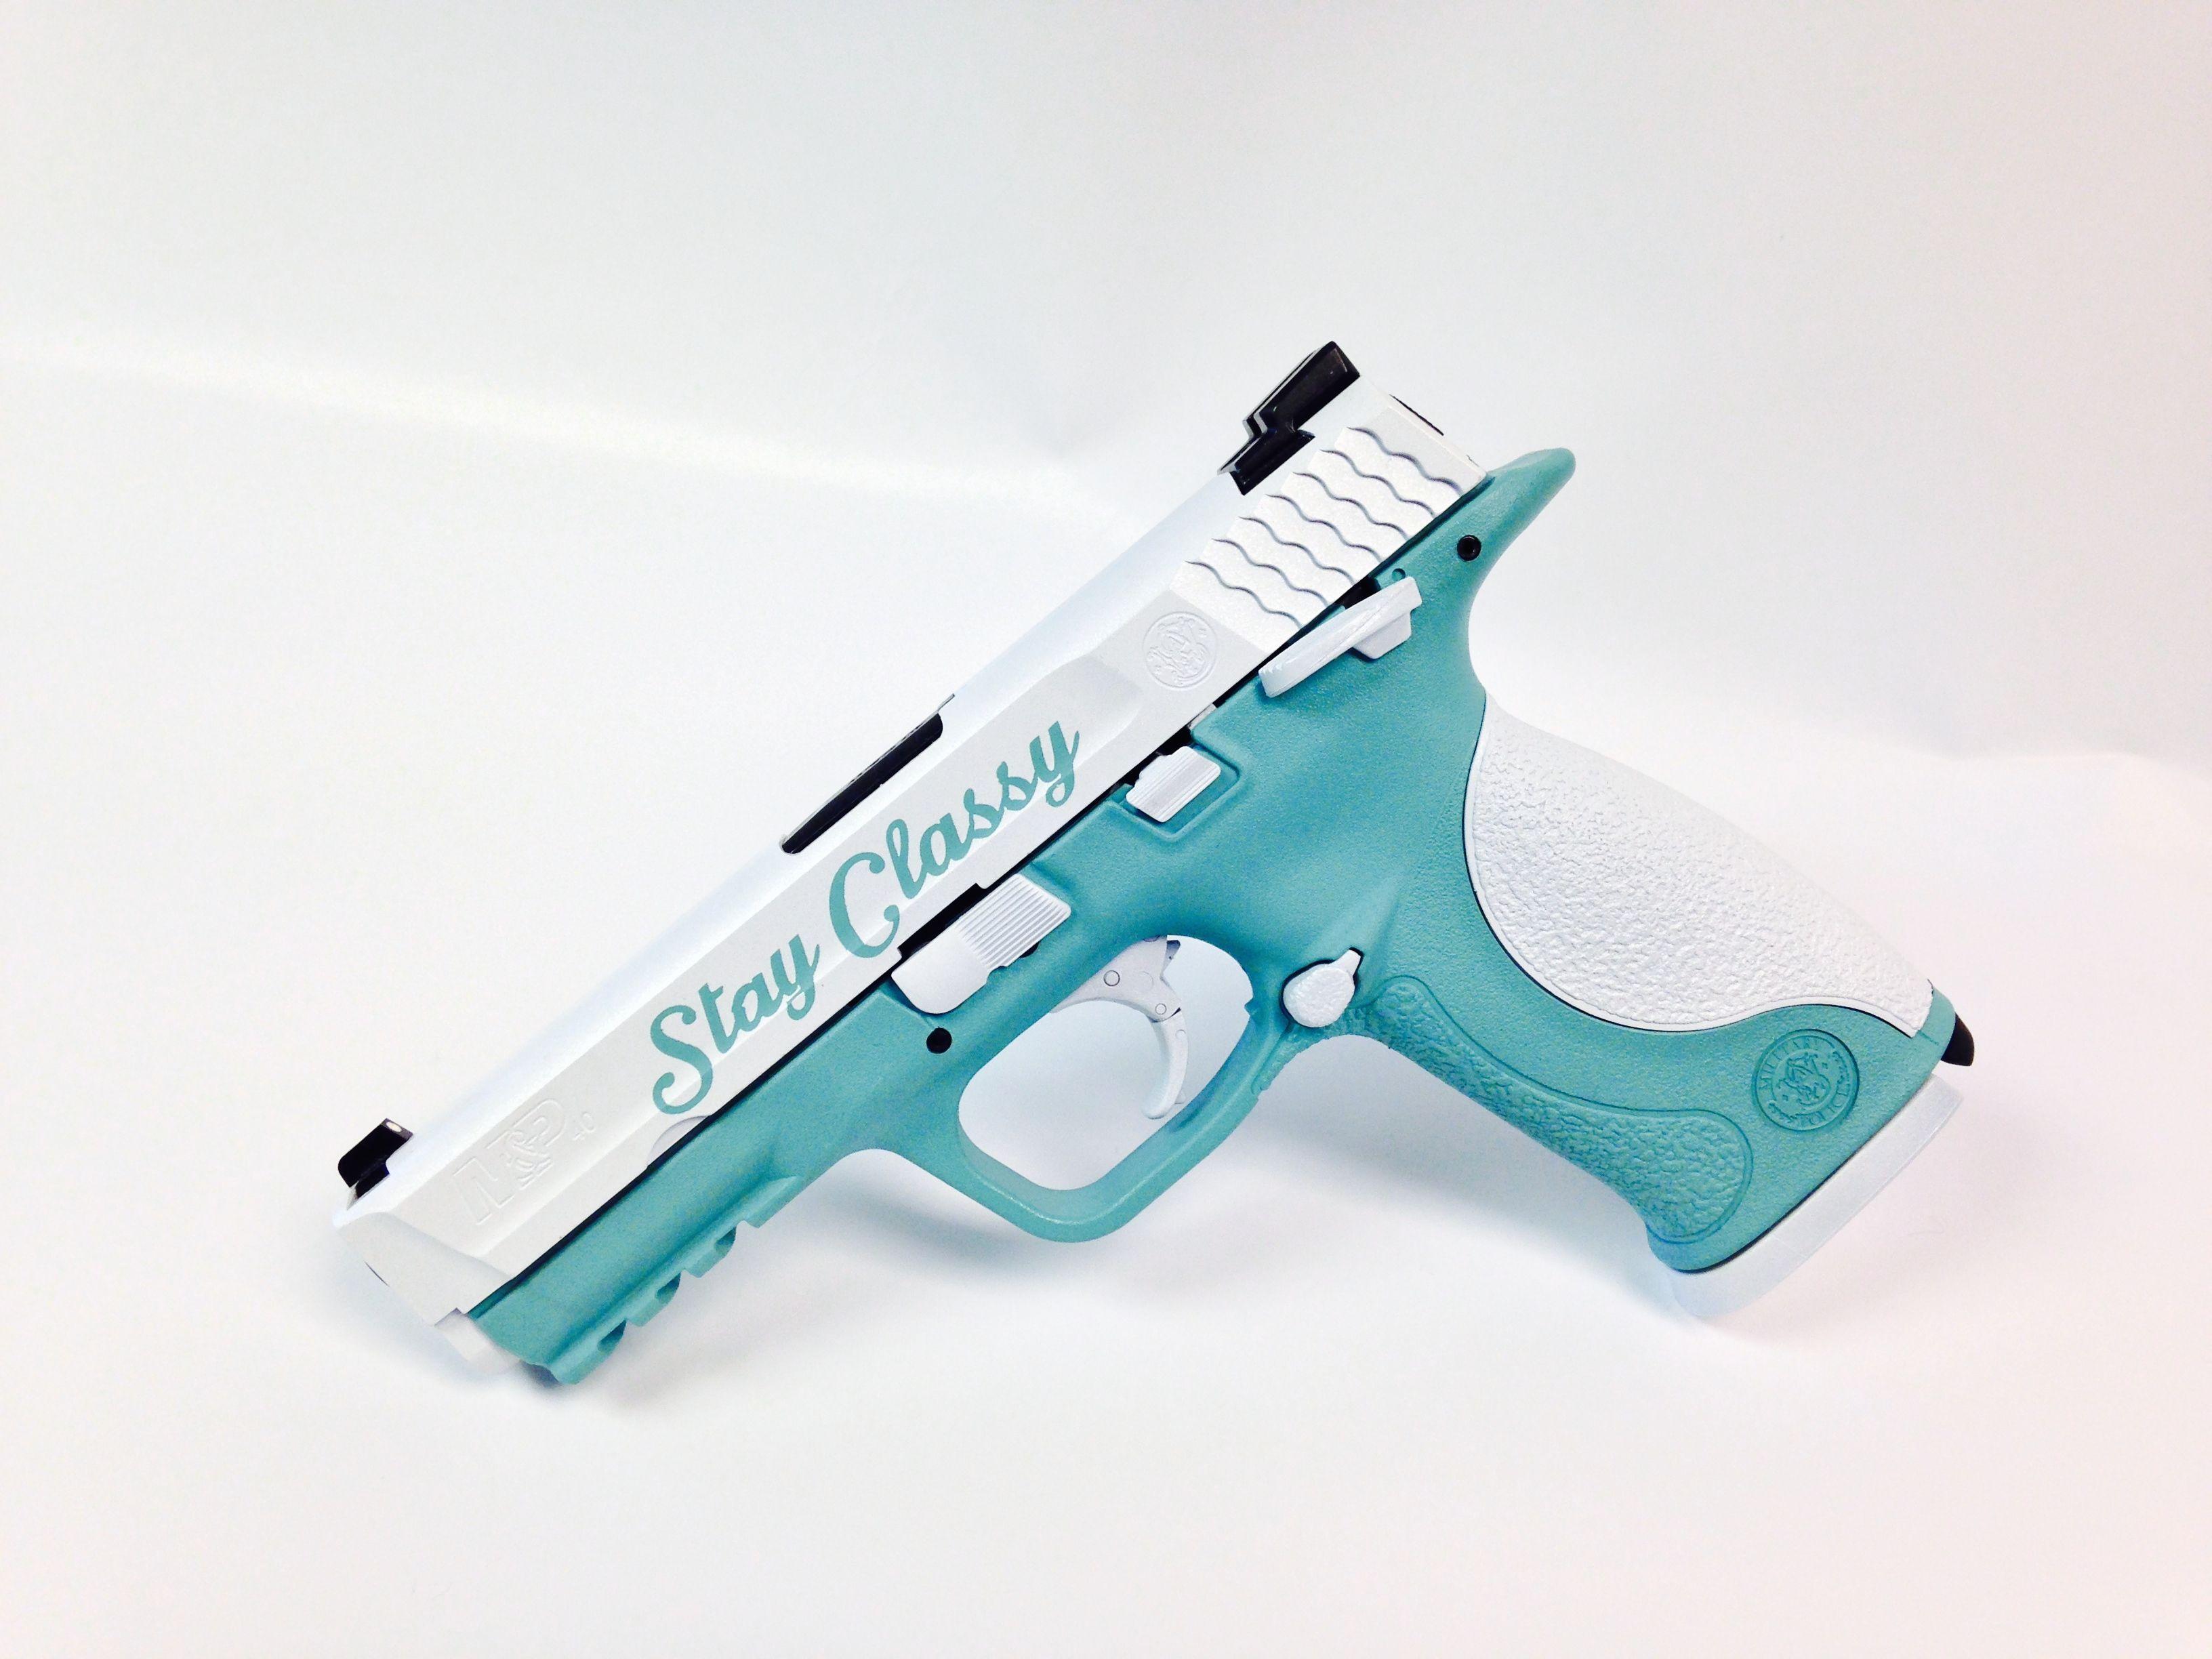 tiffany blue pistol - HD3264×2448